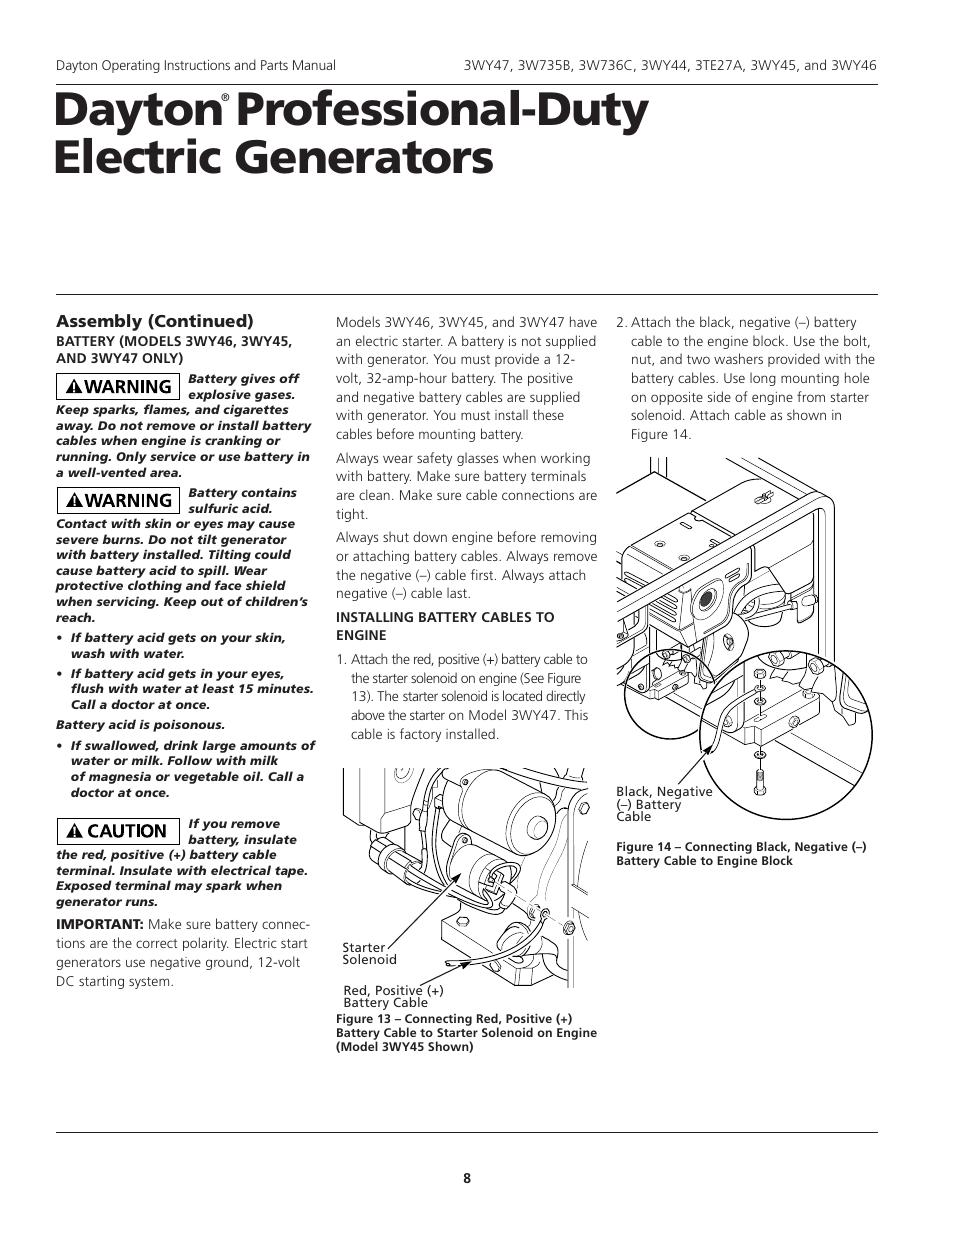 Dayton professional-duty electric generators | Dayton 3WY47